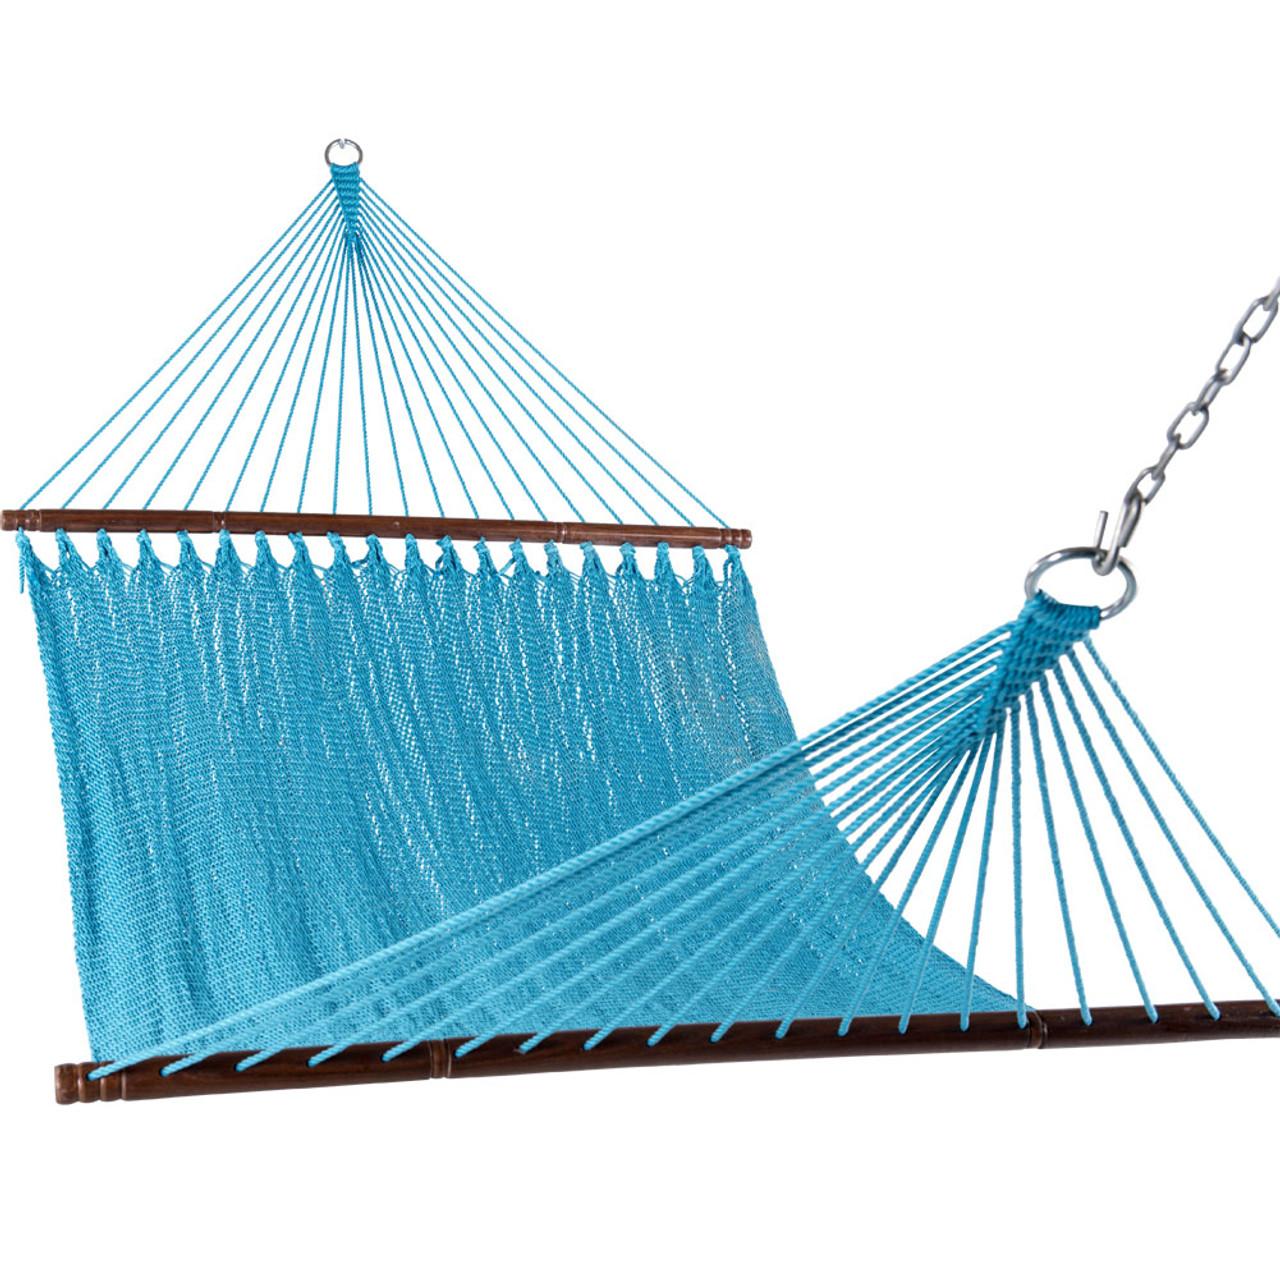 lazy daze hammocks 55 inch double caribbean hammock hand woven polyester rope outdoor handmade patio swing 55 inch double caribbean hammock hand woven polyester rope outdoor      rh   sundaleoutdoor